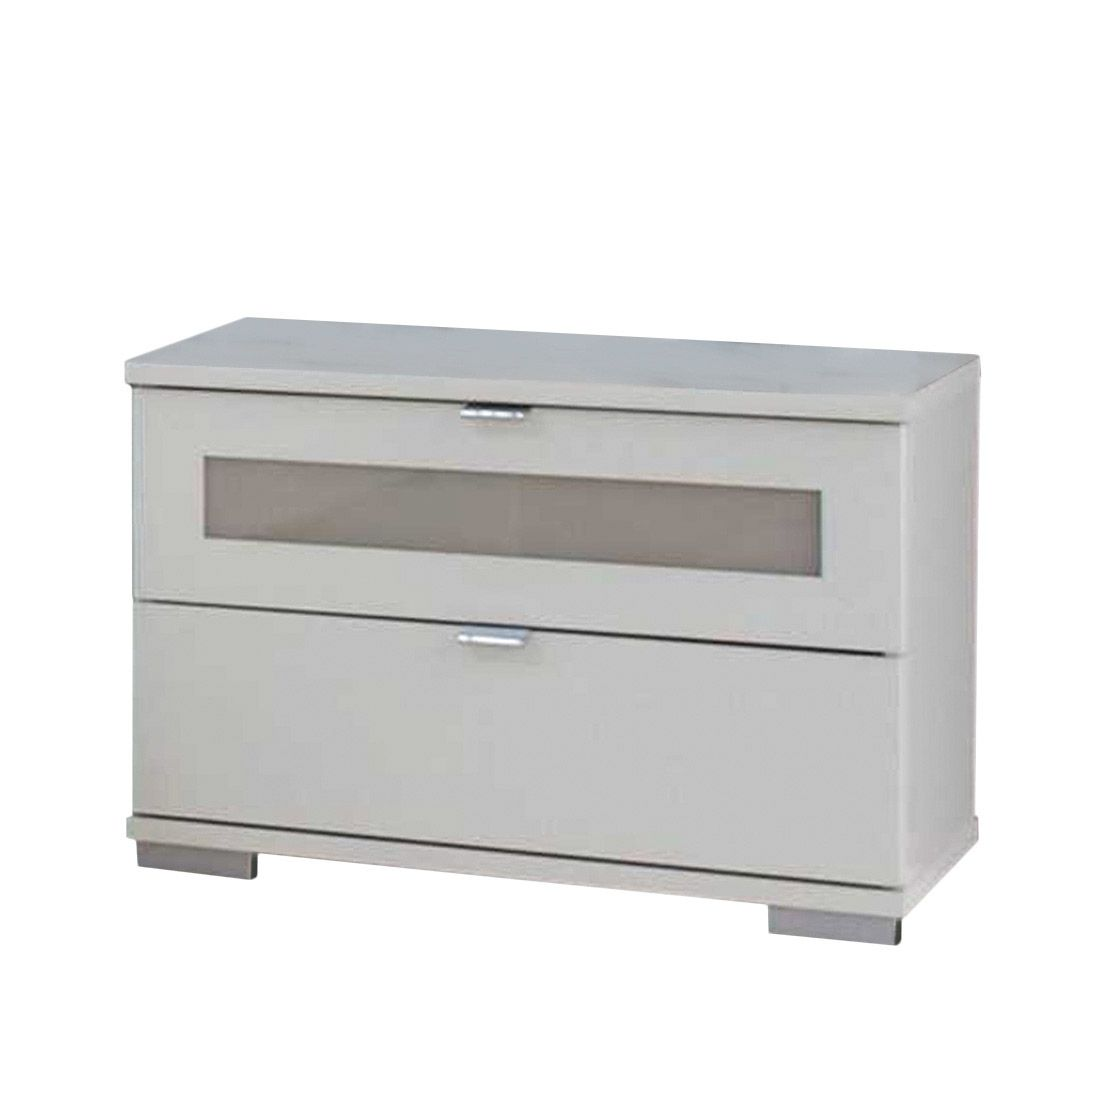 nachtschrank advantage alpinwei sandgrau glas sahara. Black Bedroom Furniture Sets. Home Design Ideas